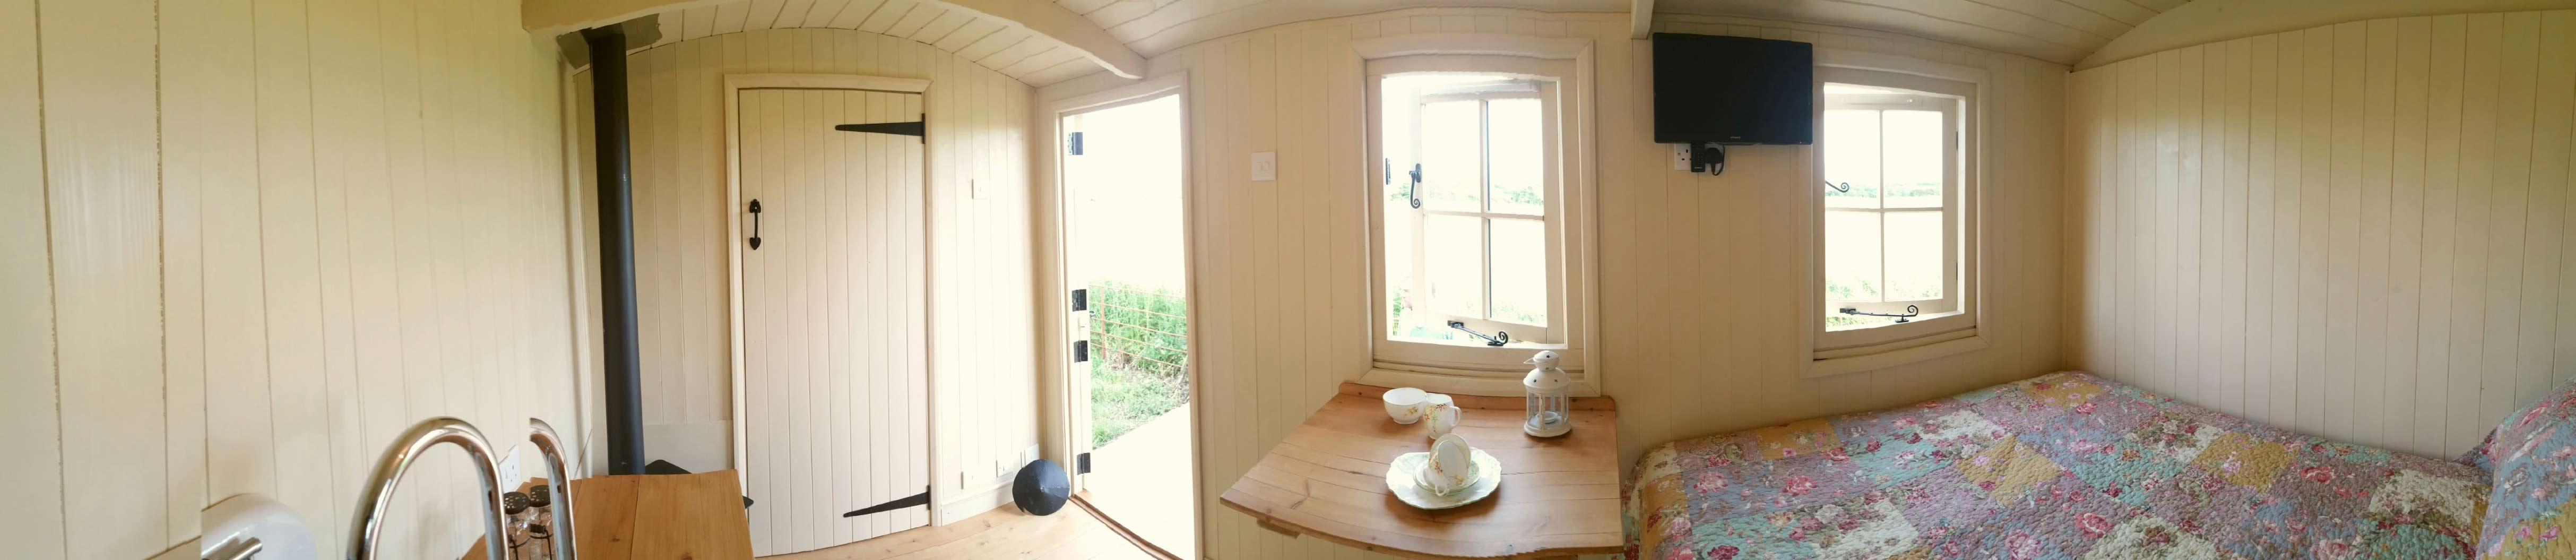 Inside-Shepherds-Hut-Panoram-Bath